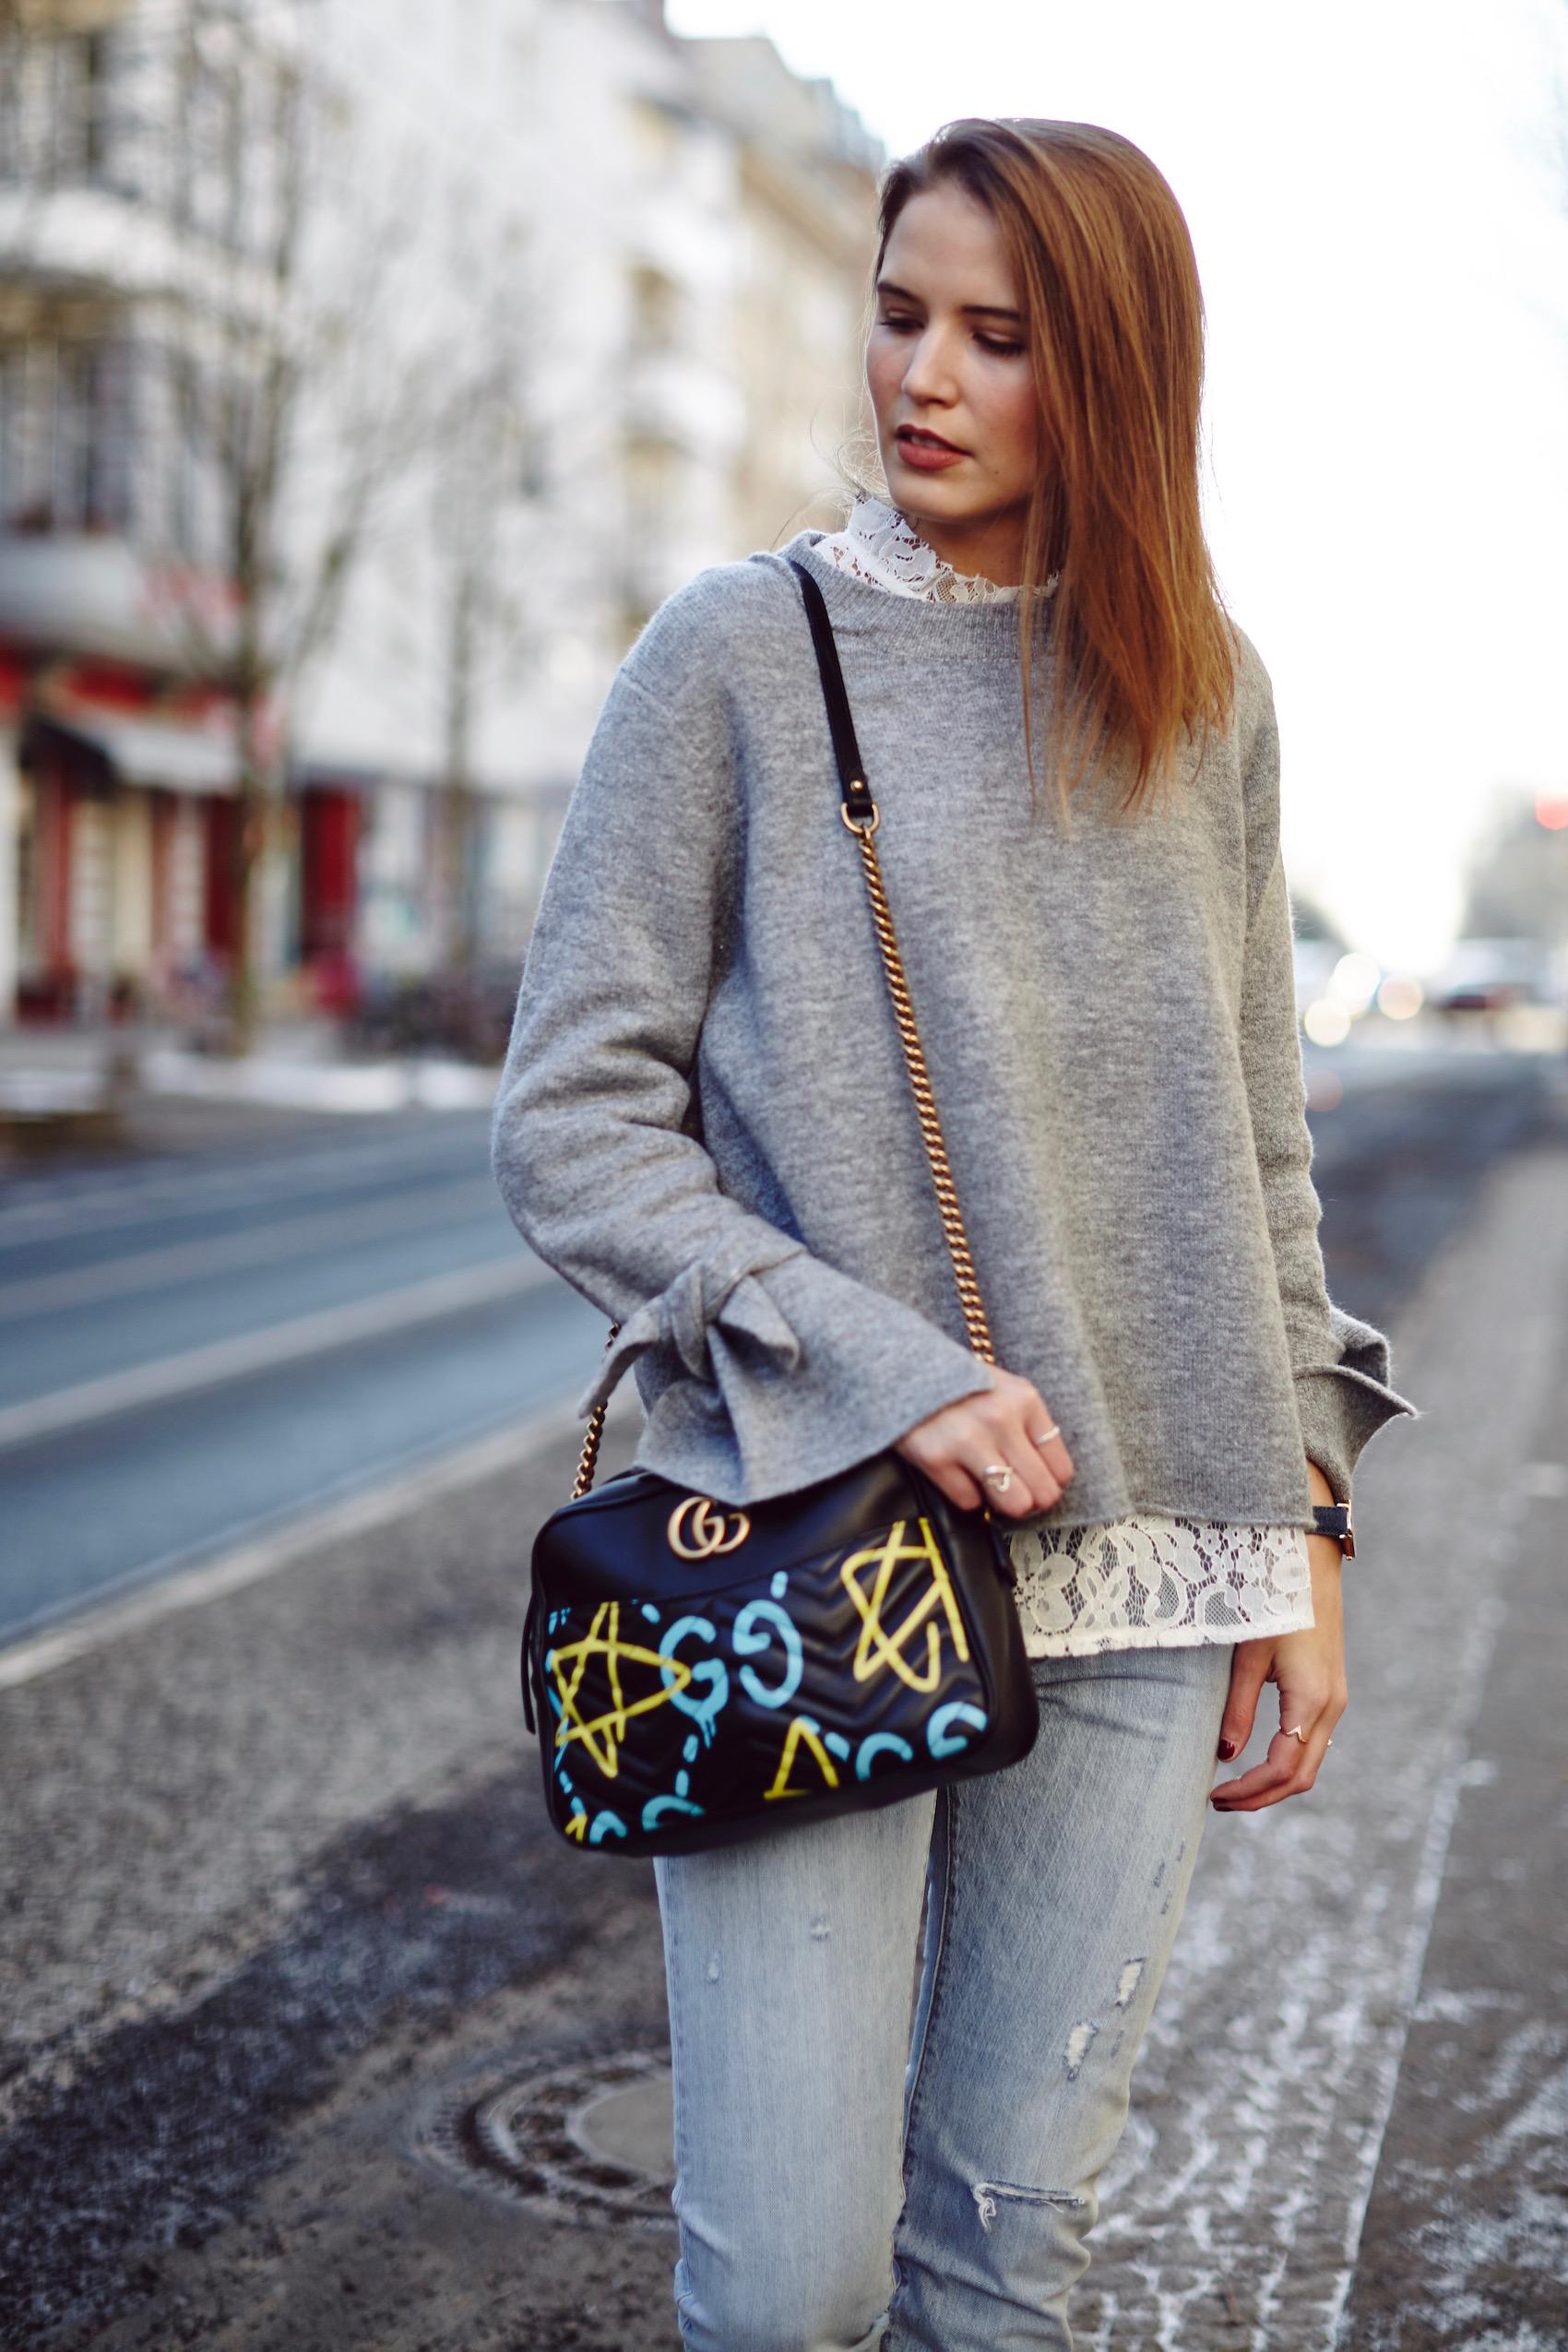 sue_loves_nyc_fashion_week_berlin_gucci_ghost_closed_mantel_Levi's_501_Skinny_SuelovesNYC_Susan_Fengler_05